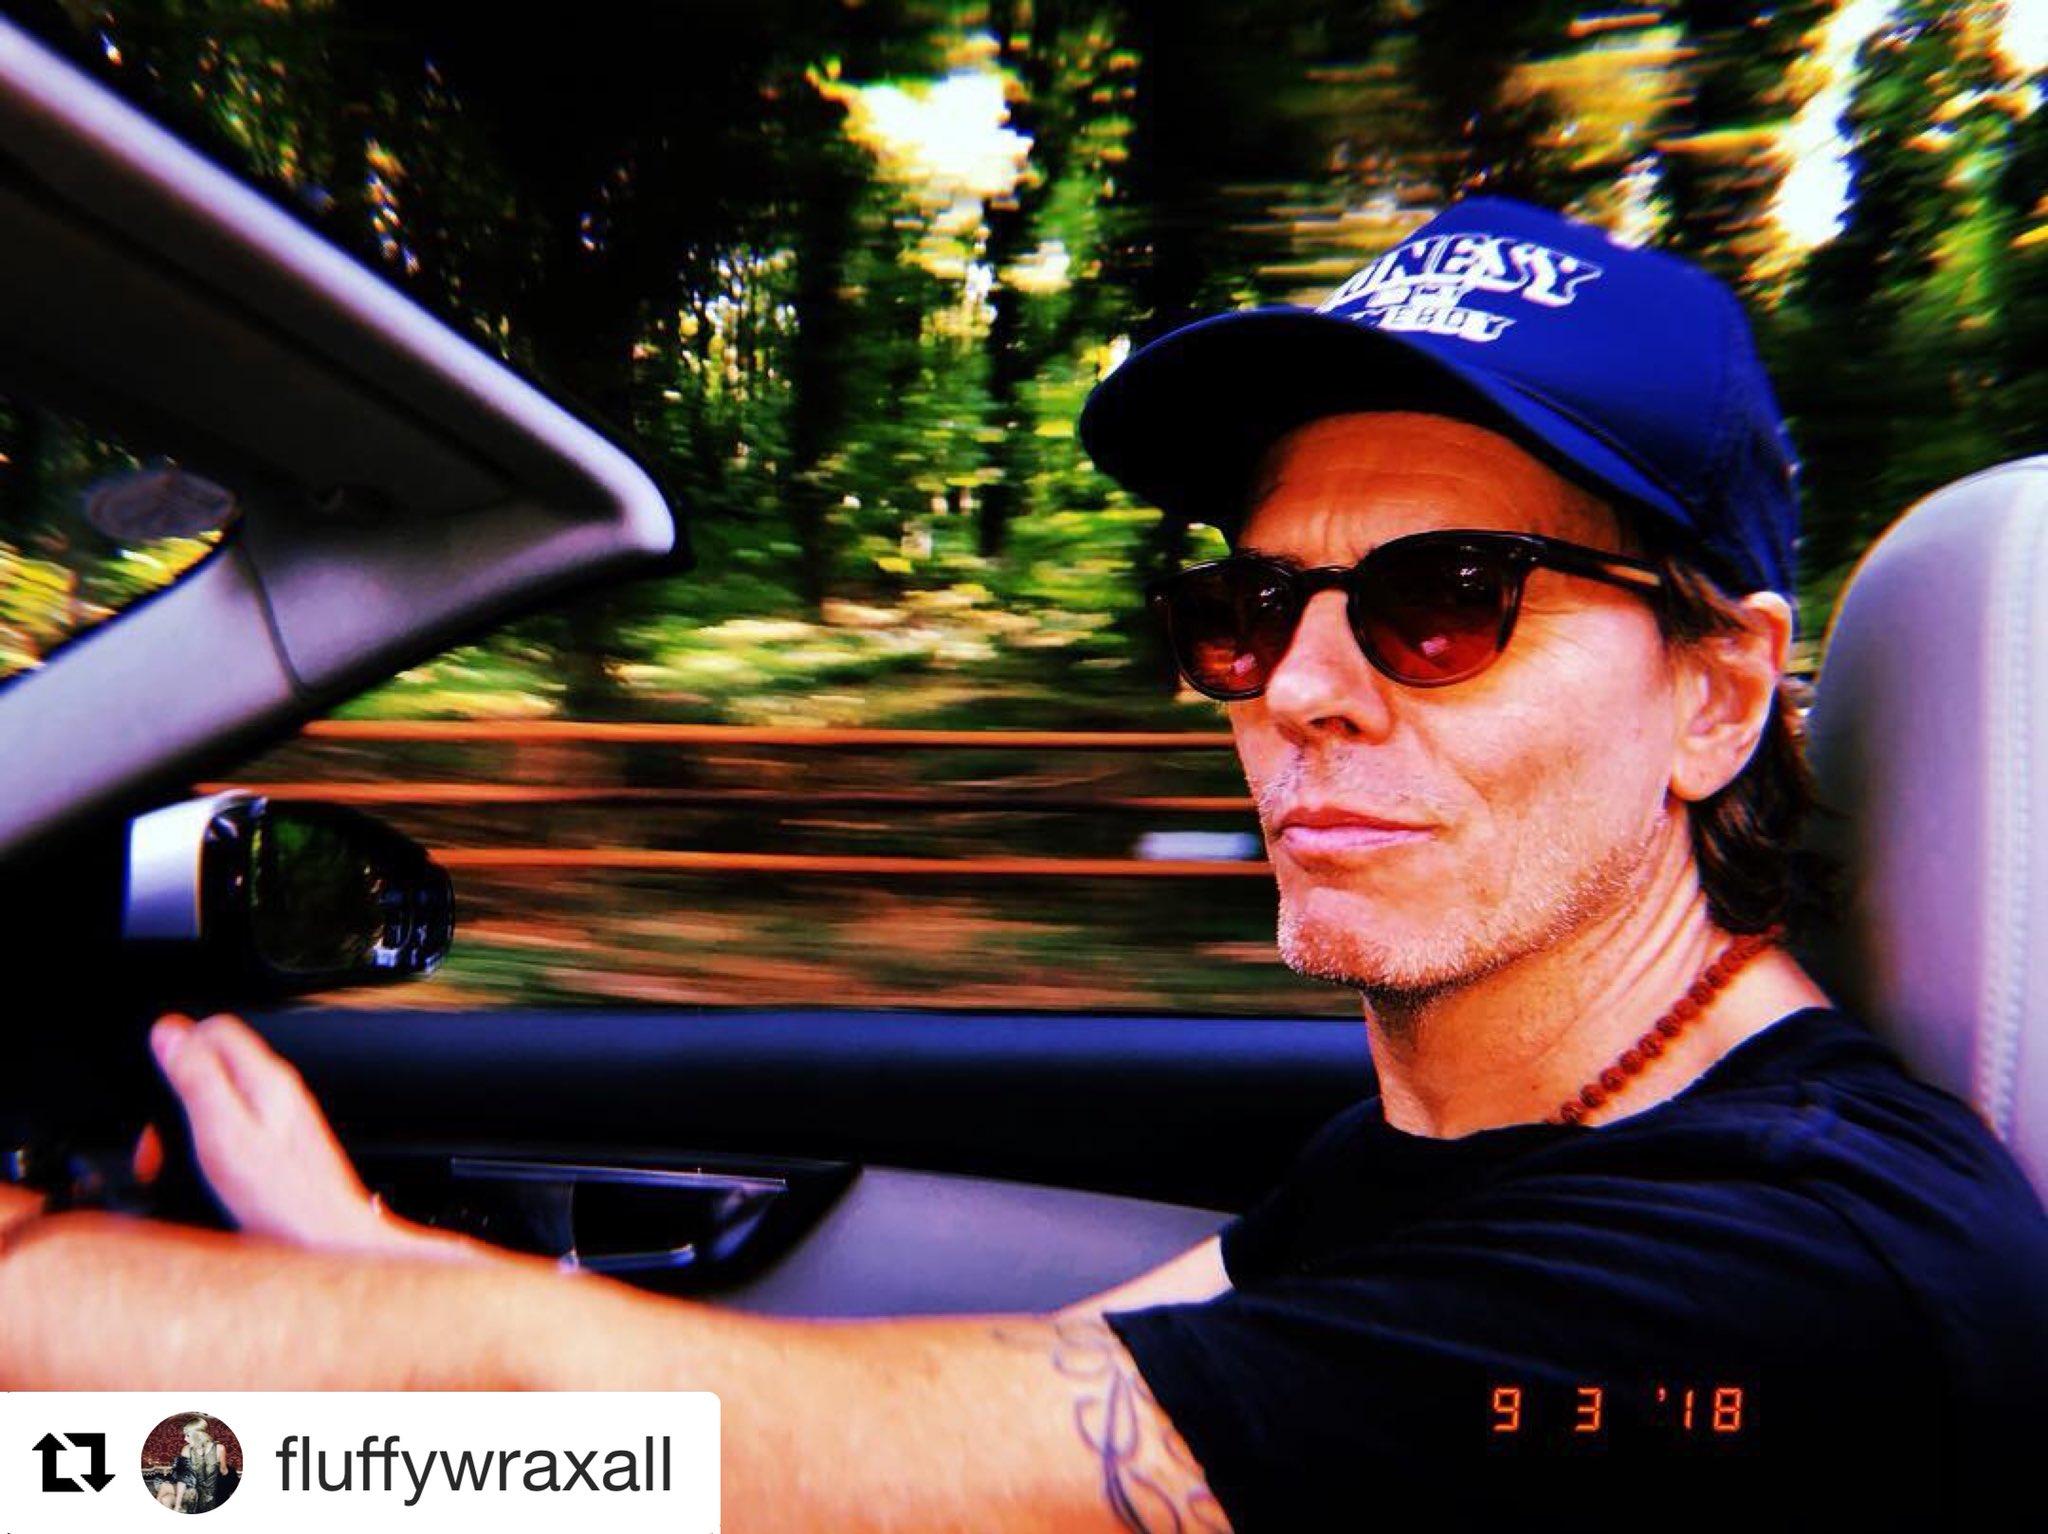 Thanks for the shot, Fluff!  ・・・ #fasterthanlight ☄️ #topdown #lastdaysofsummer https://t.co/iR6iADRUHf